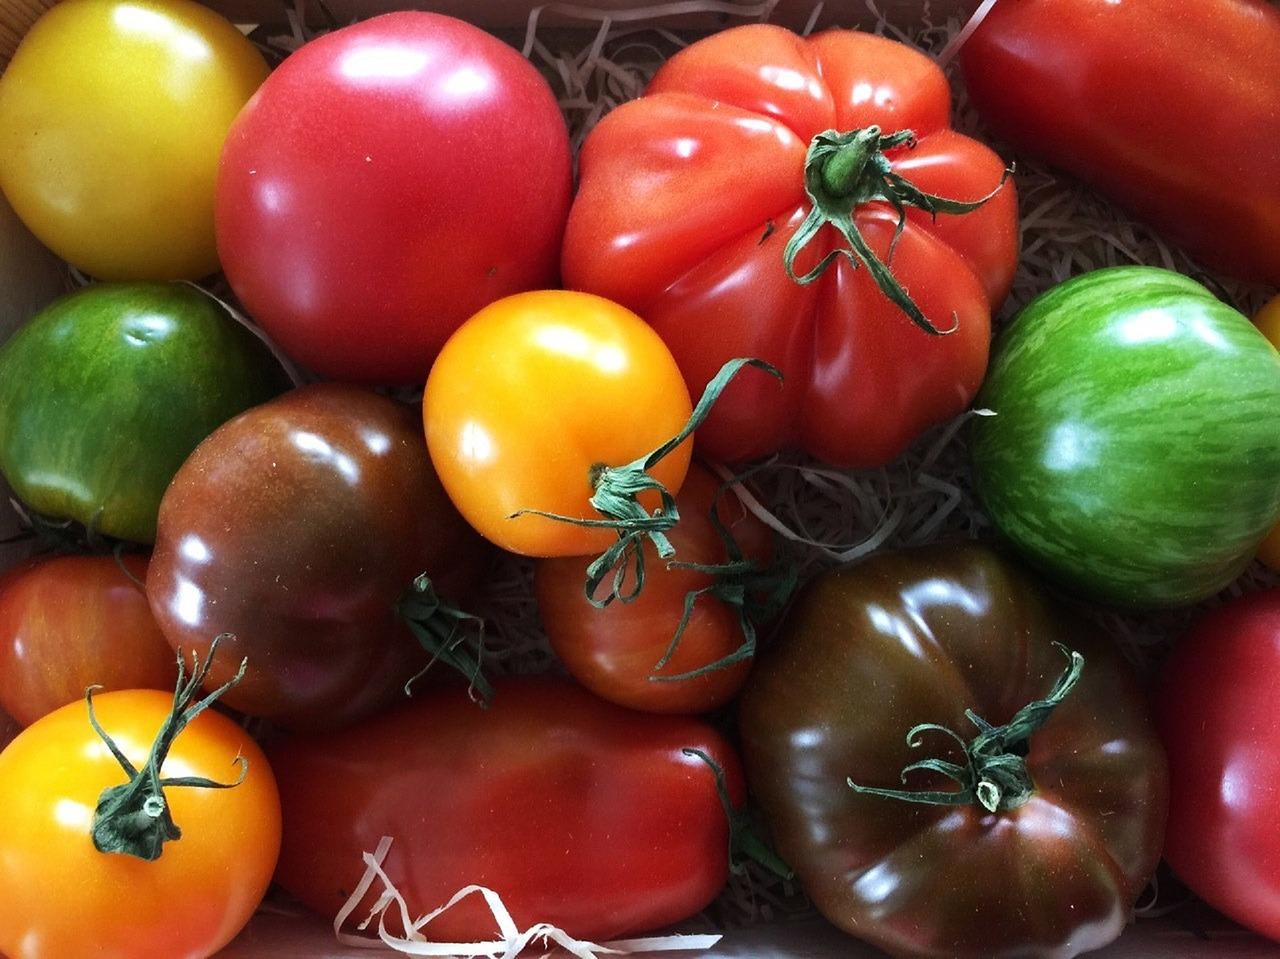 tomatoes-1556061_1280